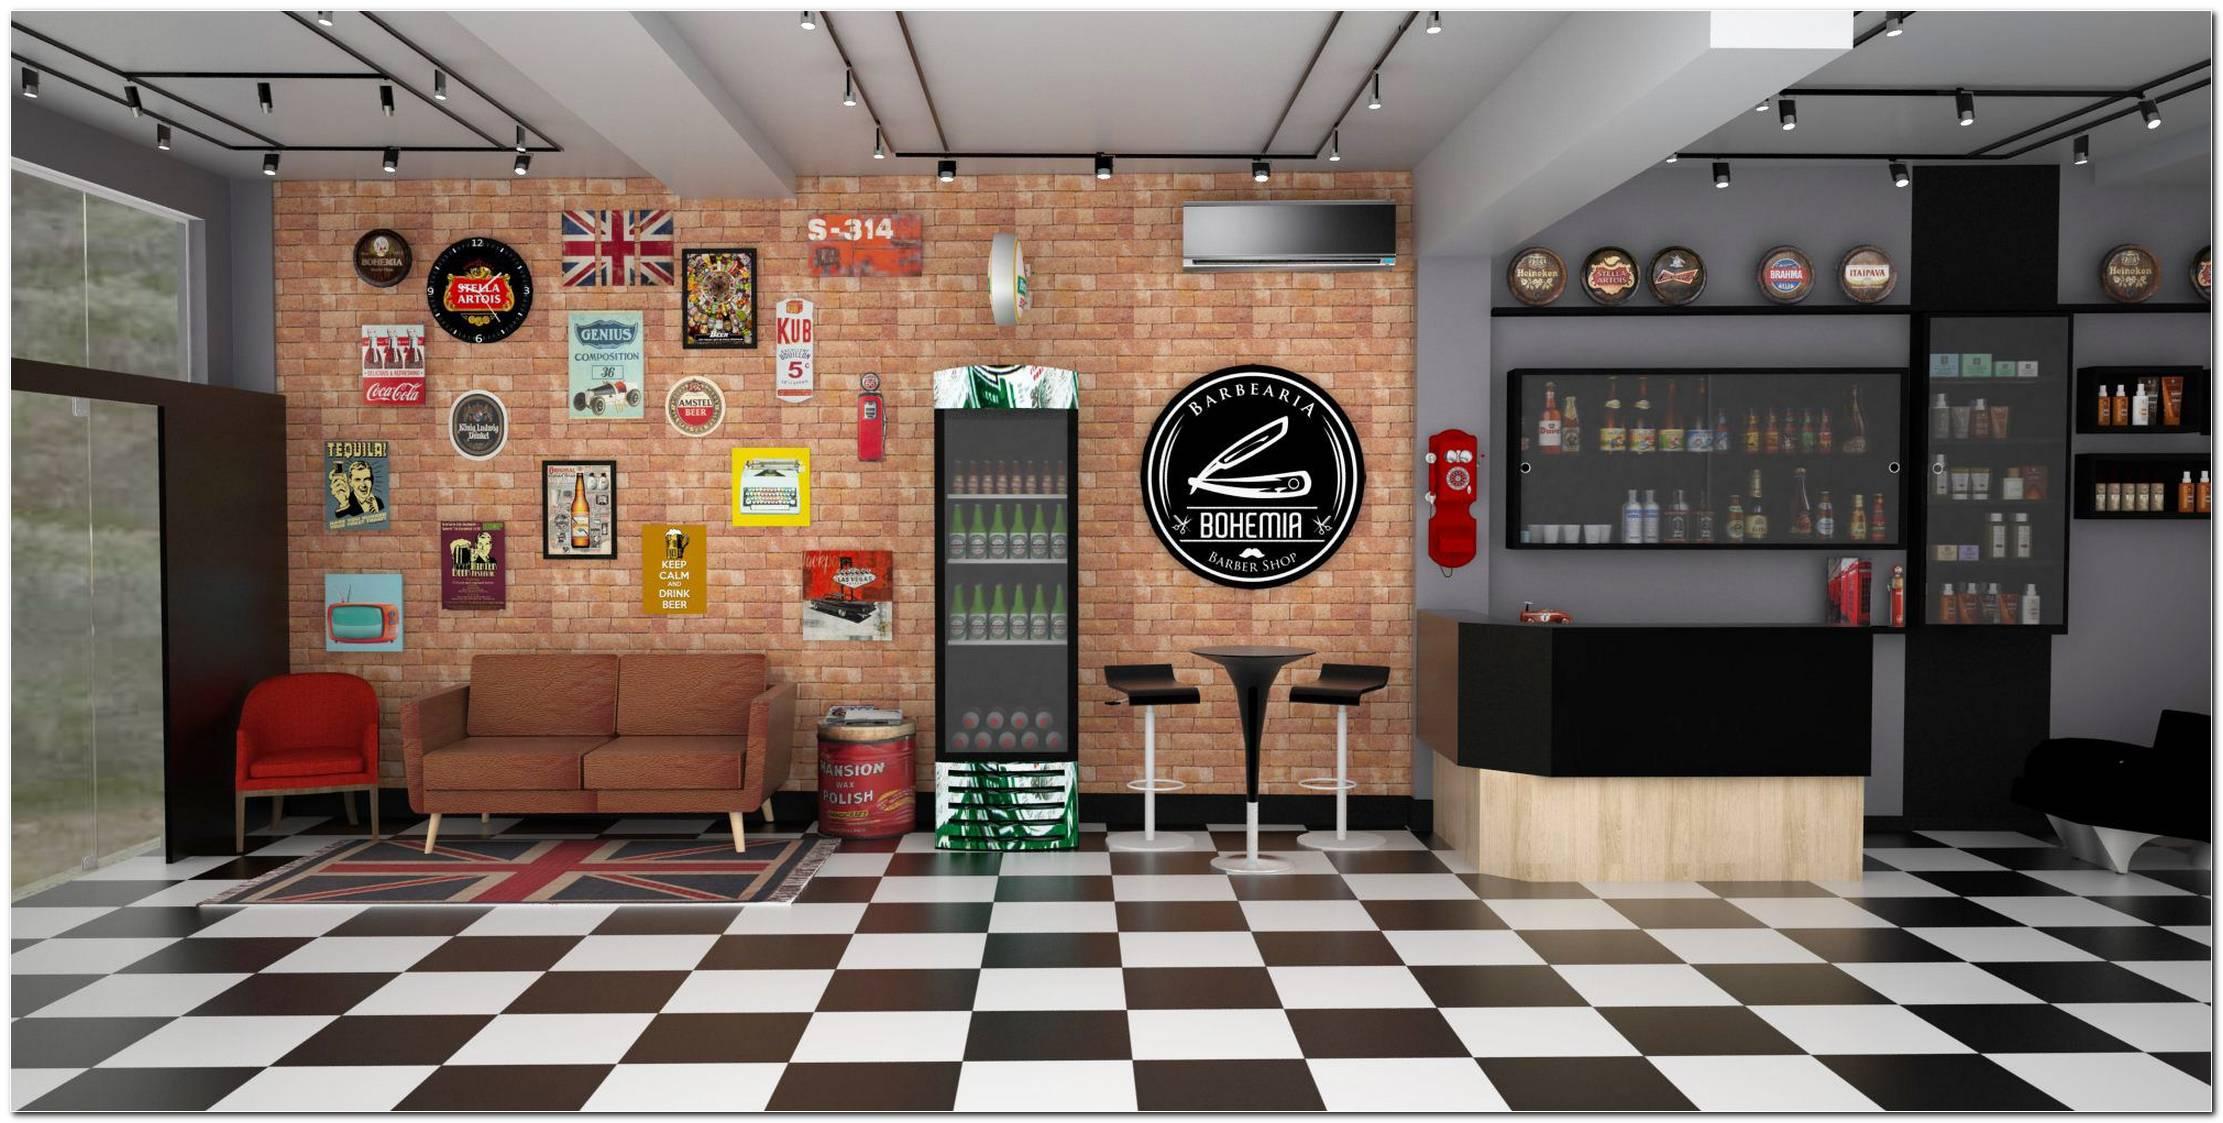 Fachada De Barbearia 50 Estilos Impecáveis Para Seu Estabelecimento